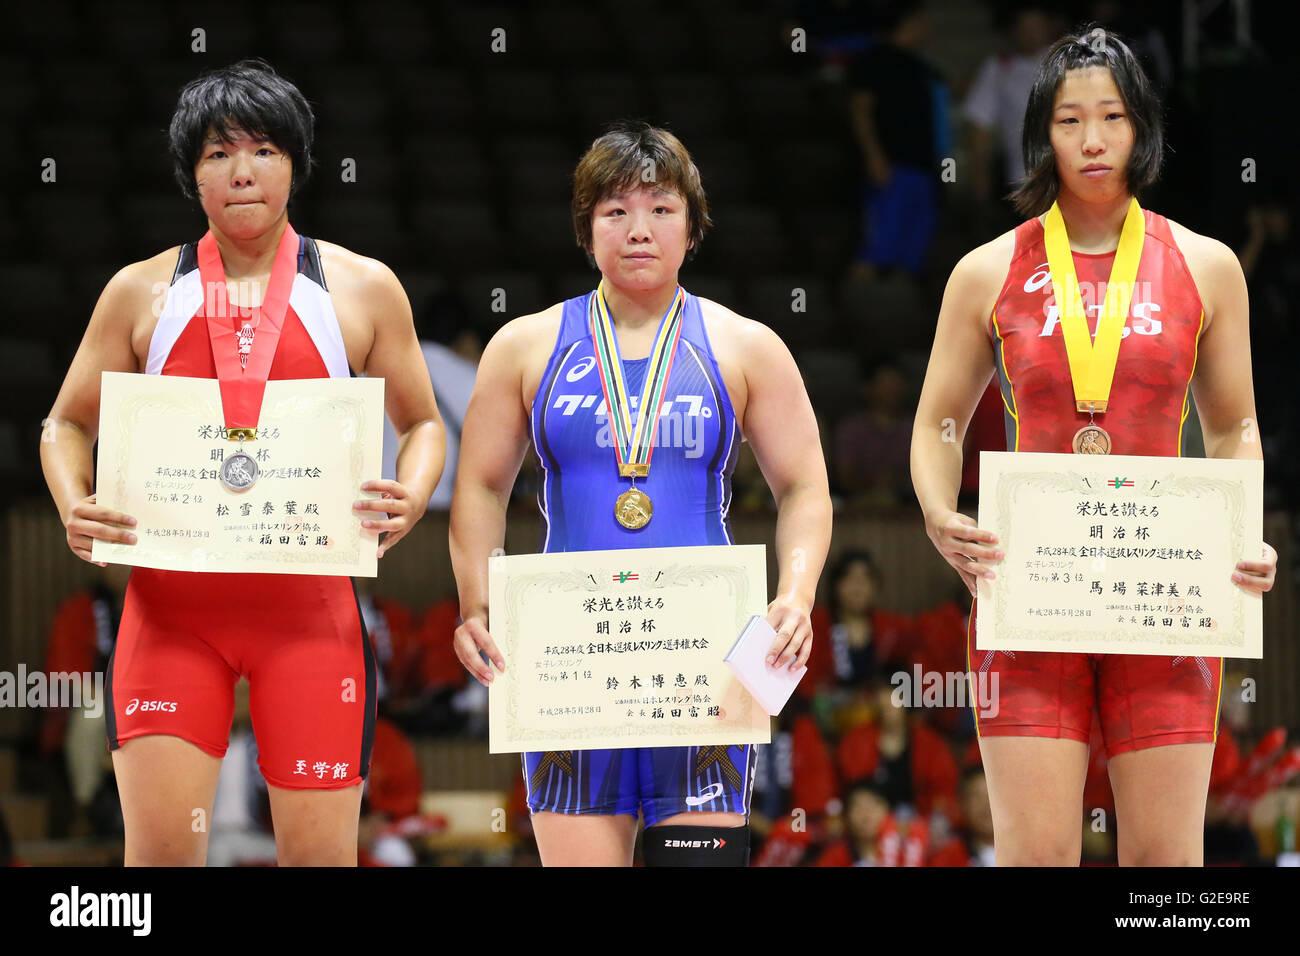 nd Yoyogi Gymnasium, Tokyo, Japan. 28th May, 2016. (L to R) Yasuha Matsuyuki, Hiroe Suzuki, Natsumi Baba, MAY 28, Stock Photo